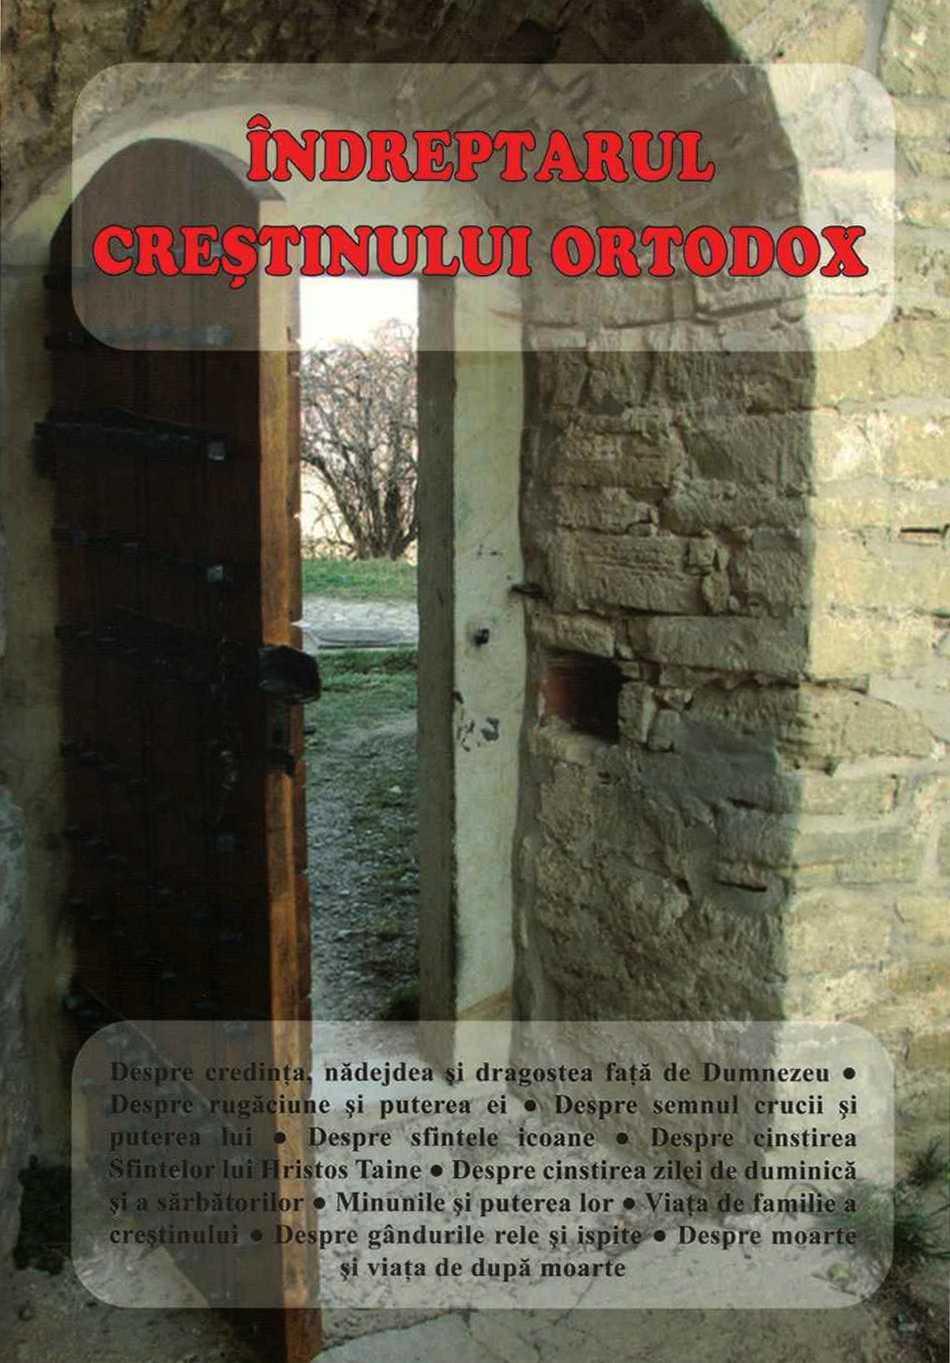 Indreptarul crestinului ortodox